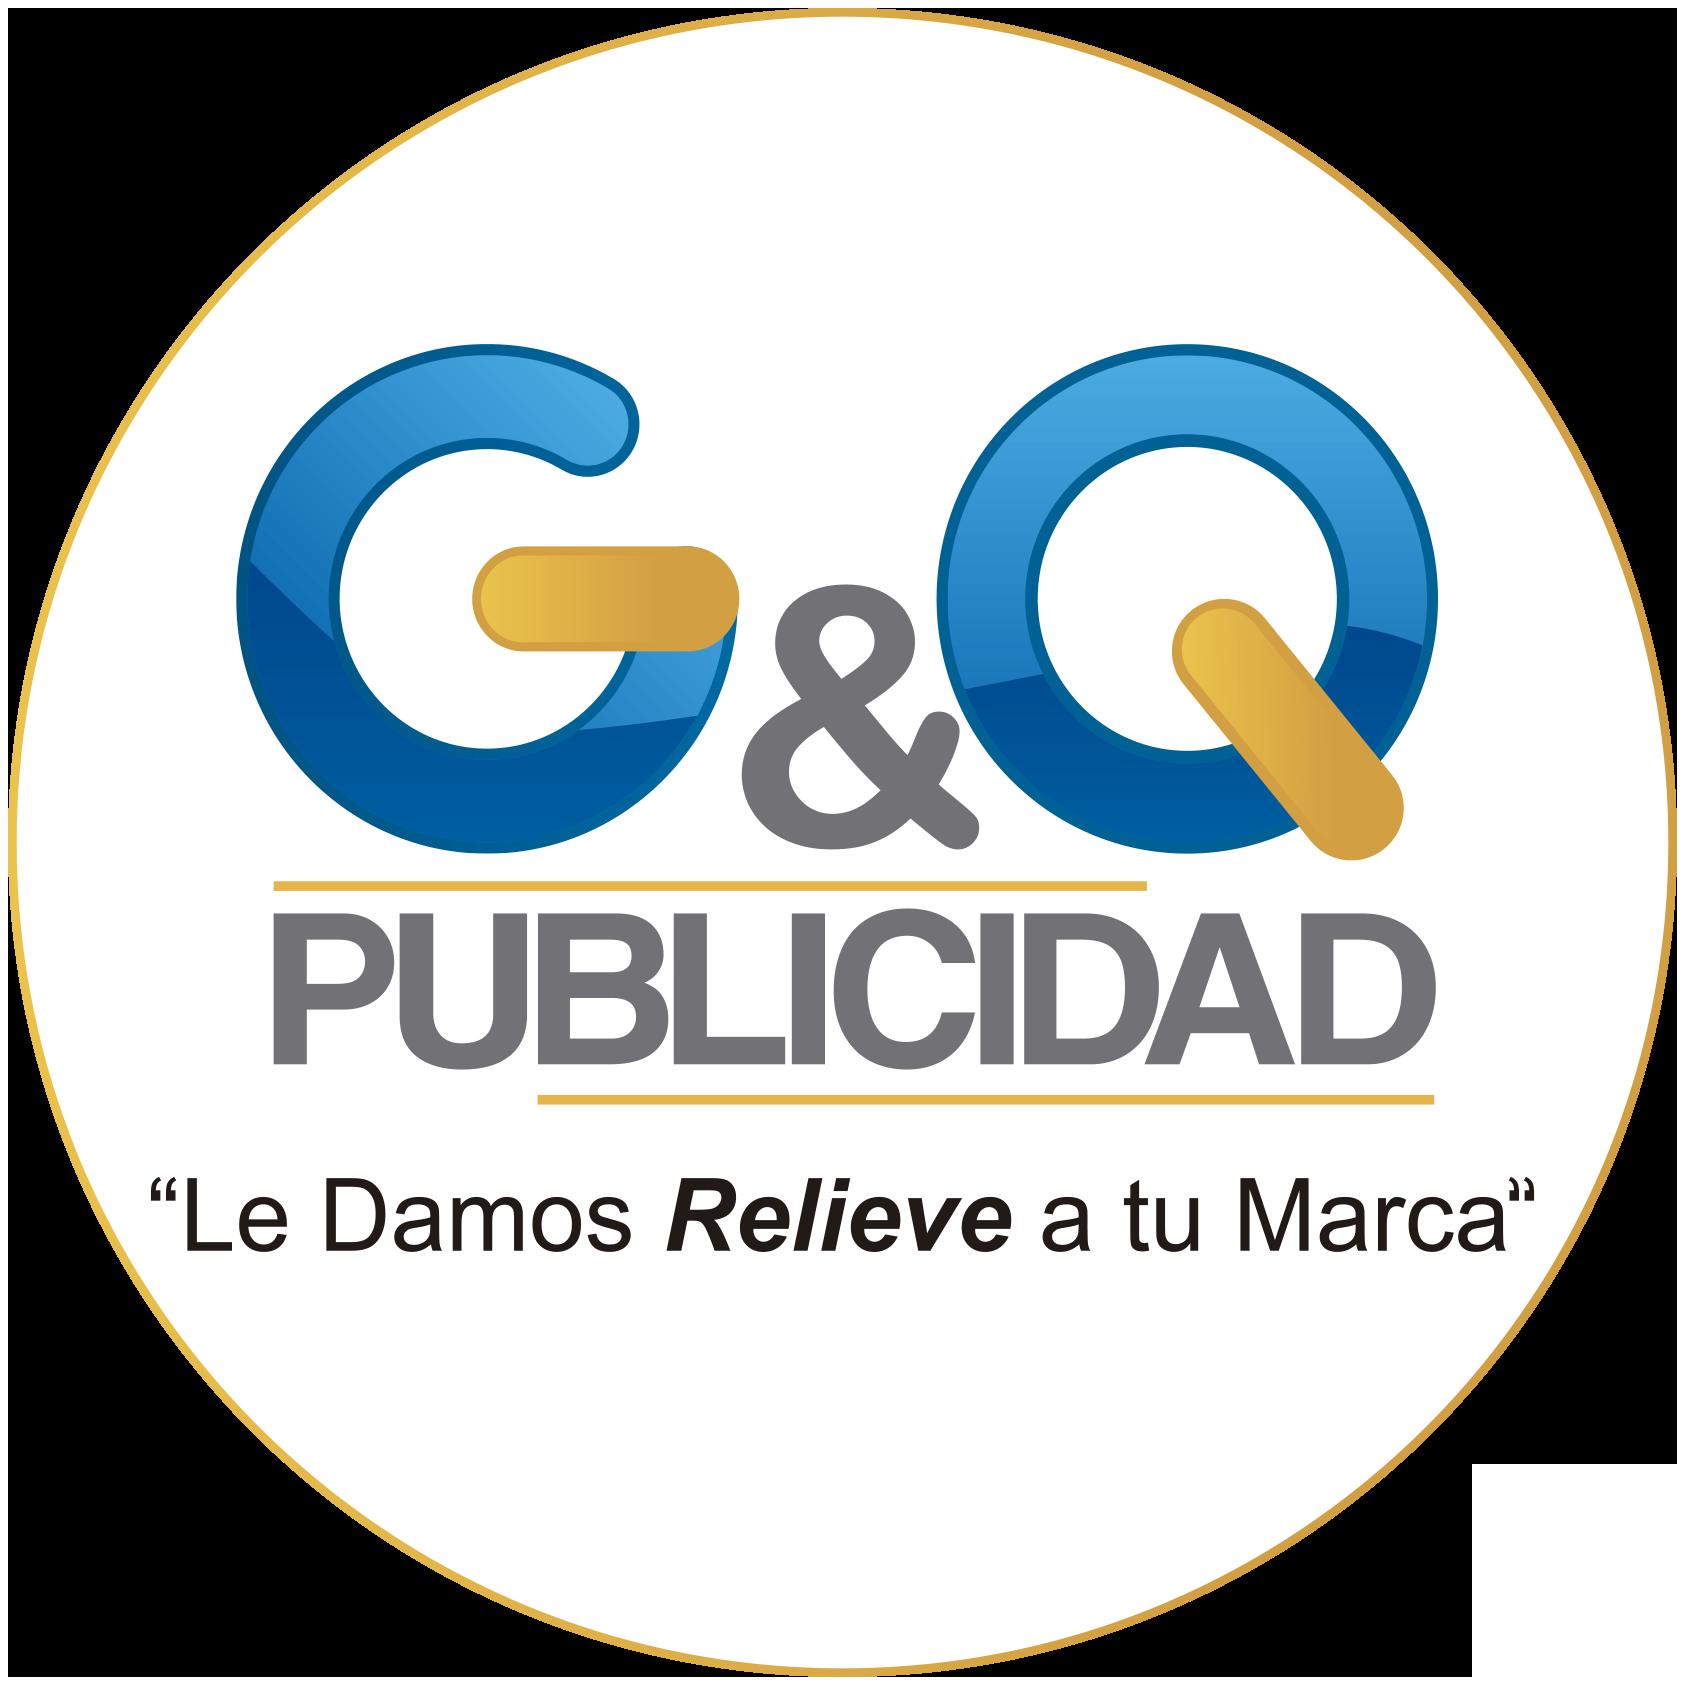 G&Q SAC Publicidad